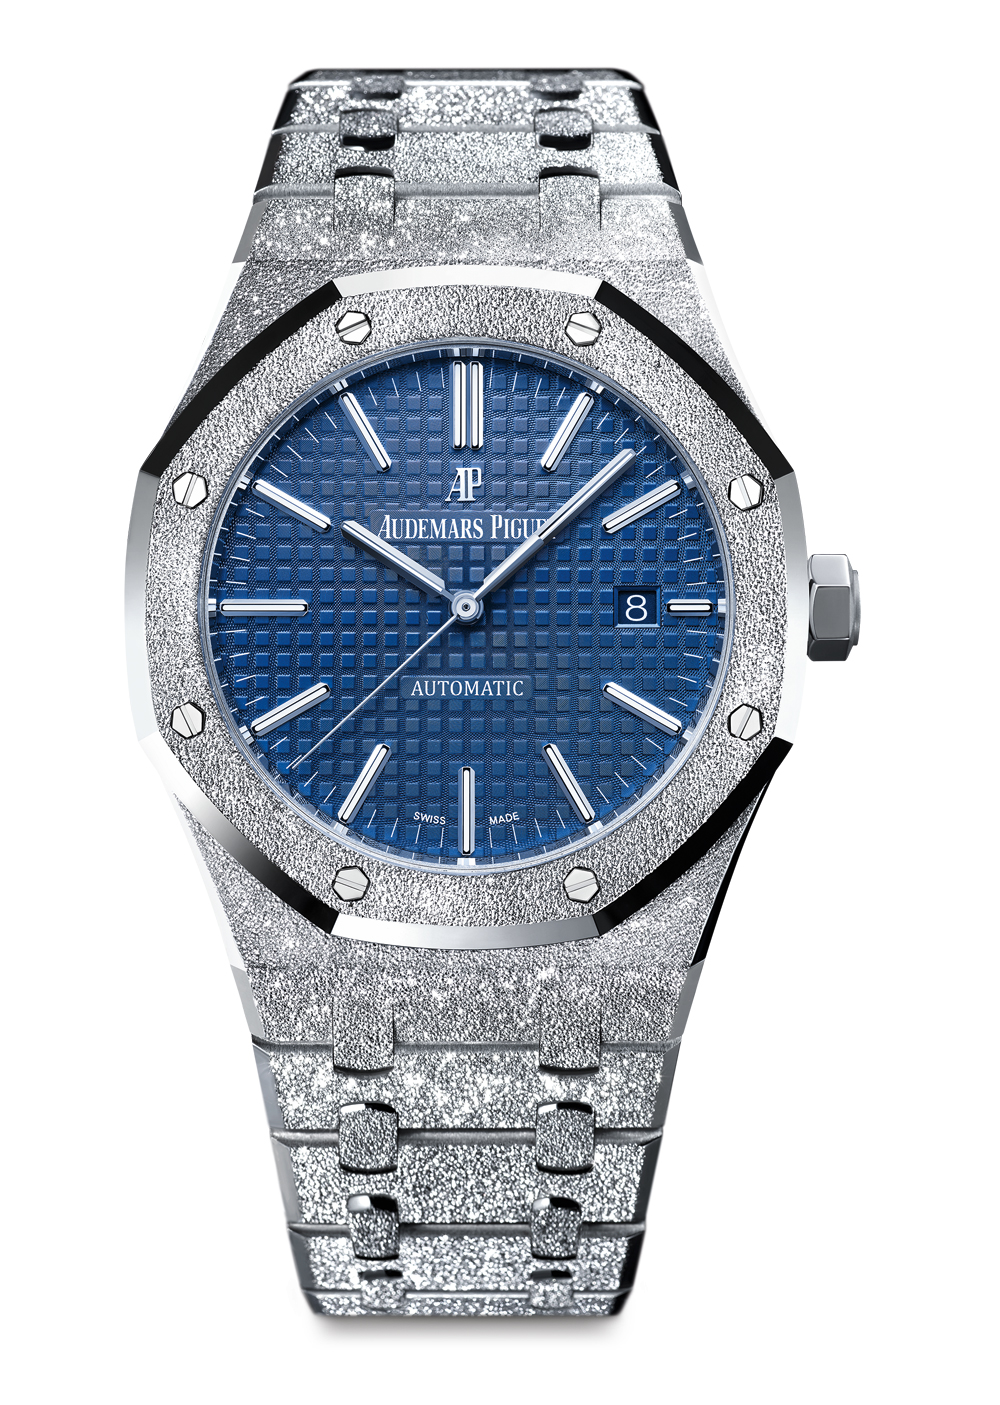 Reloj AUDEMARS PIGUET ROYAL OAK FROSTED GOLD EDICIÓN LIMITADA (41MM)